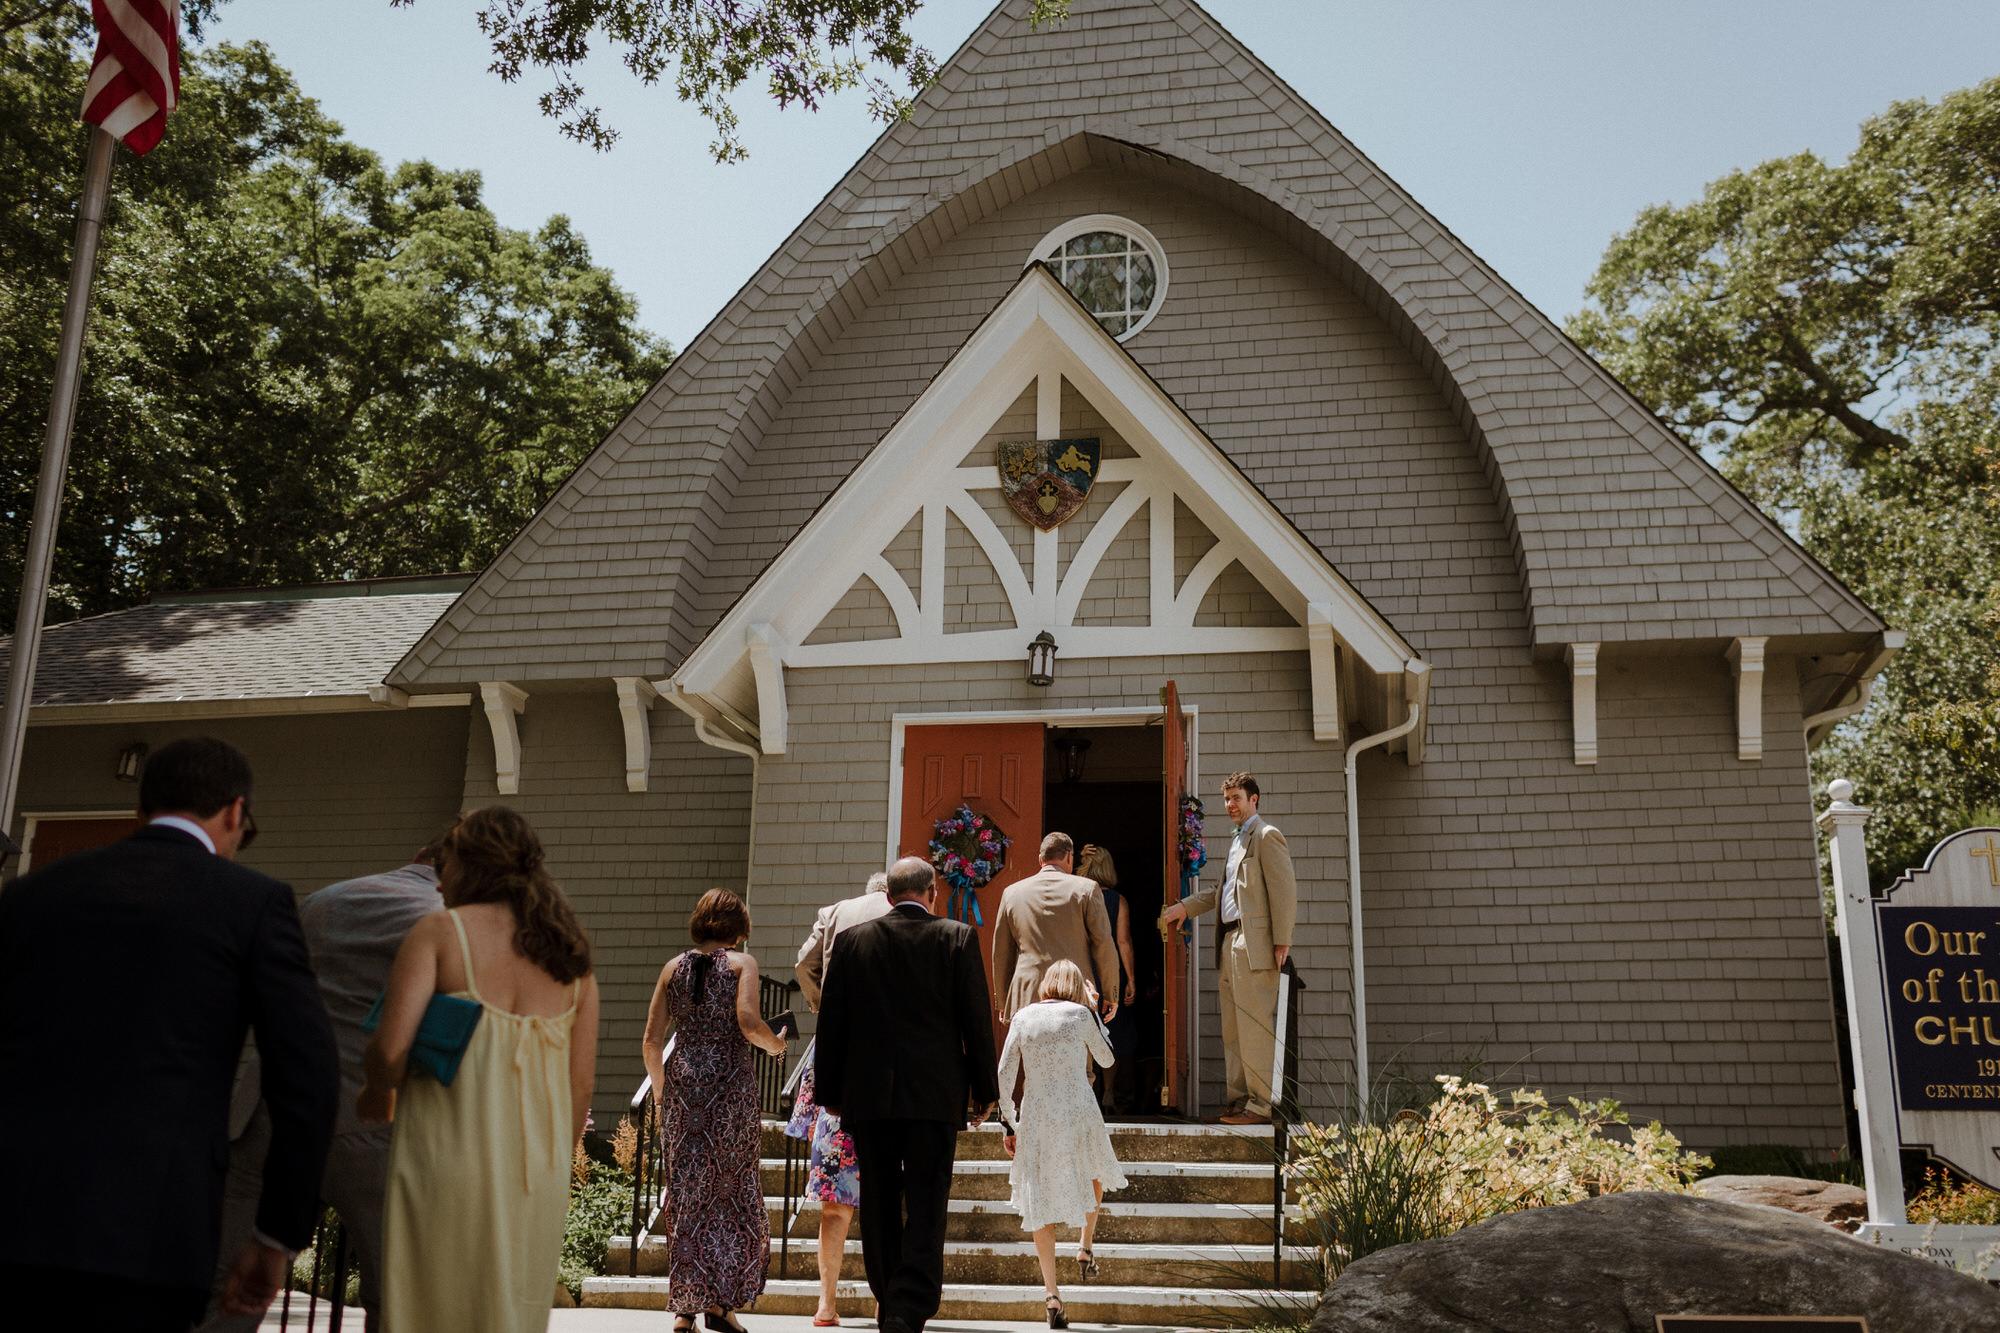 068_Rams Head Inn wedding photography, Shelter Island, New York_Island Wedding.jpg